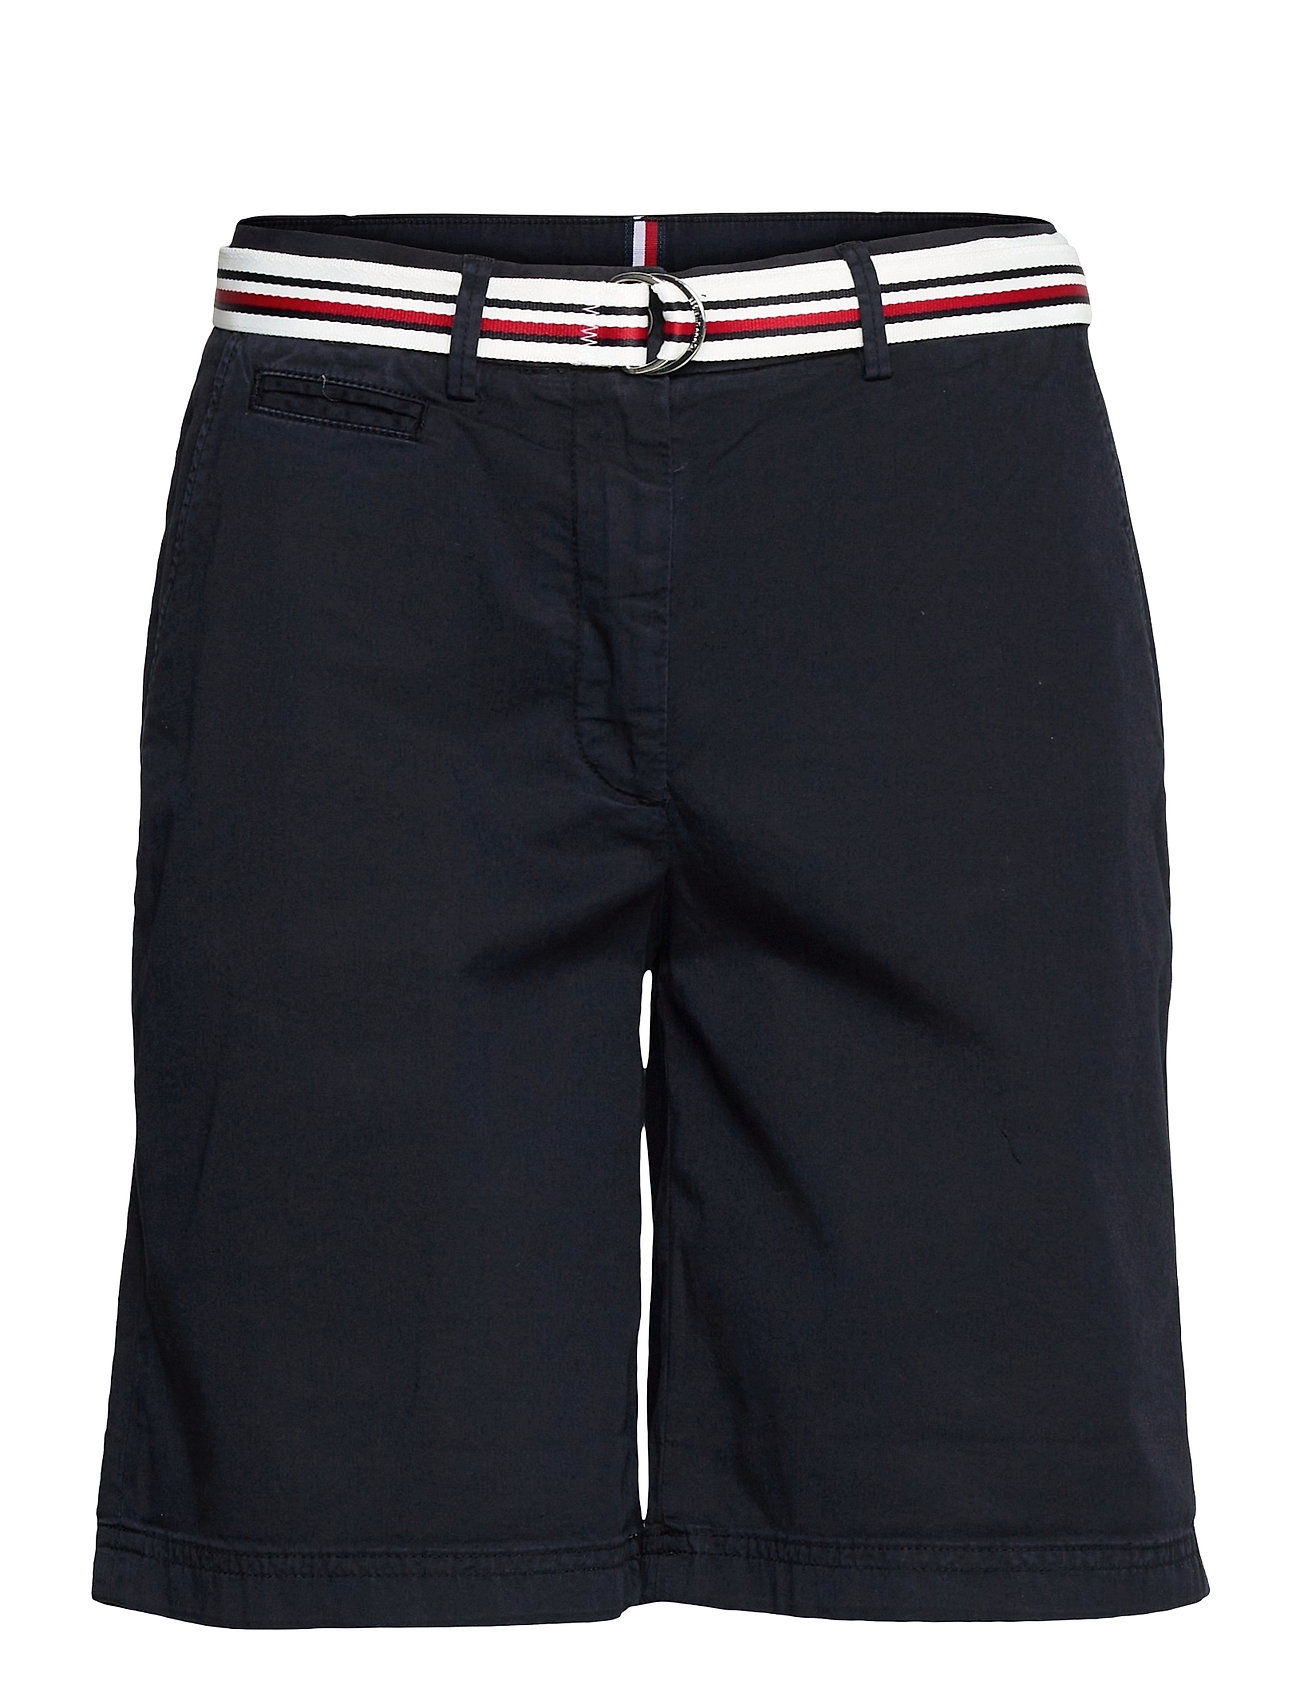 Image of Cotton Tencel Chino Rw Short Shorts Chino Shorts Blå Tommy Hilfiger (3507965169)